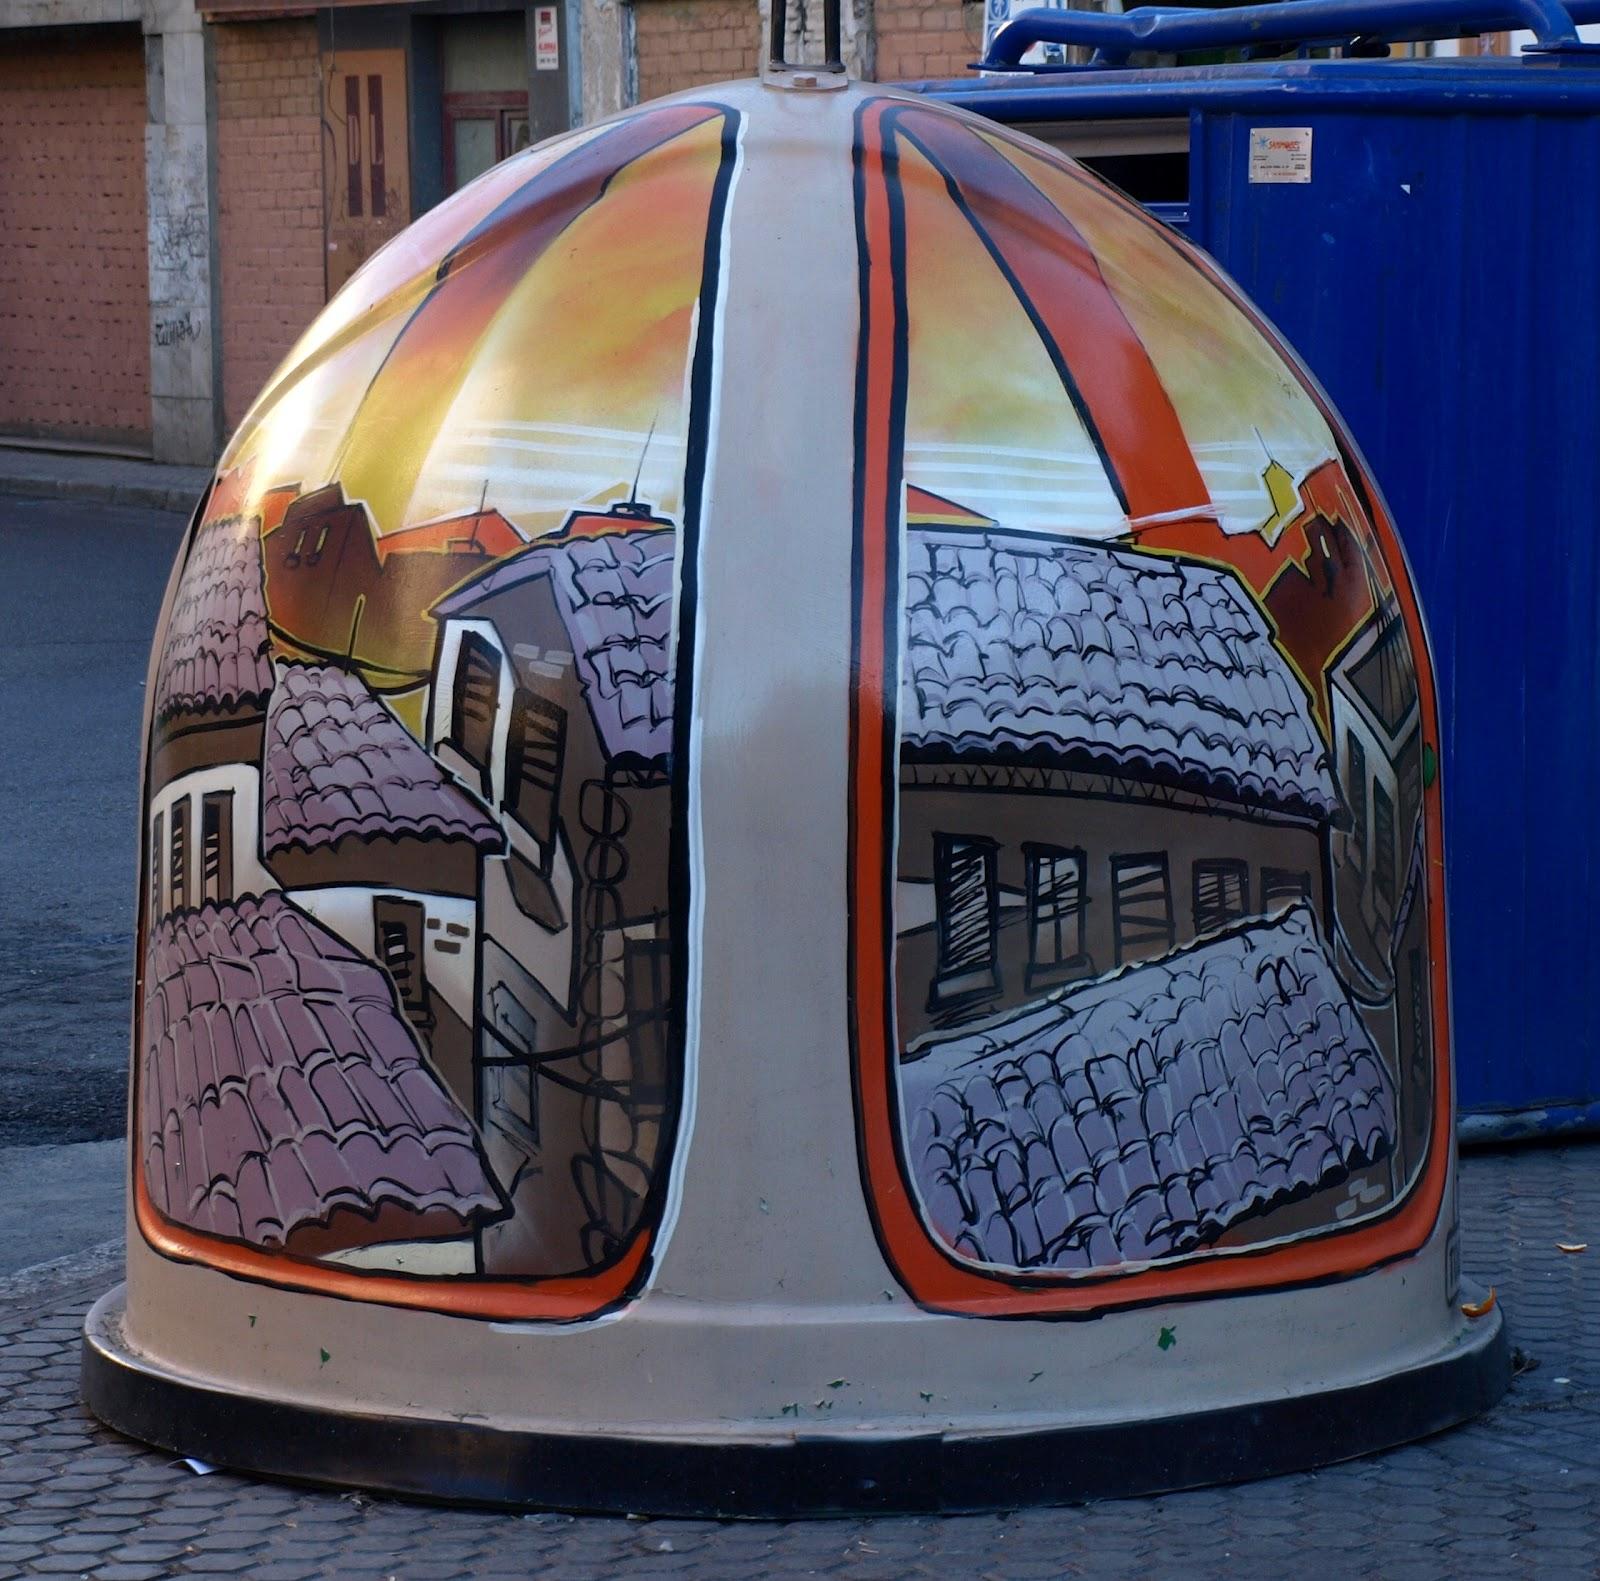 Arte en contenedores de vidrio. PB+Contenedores